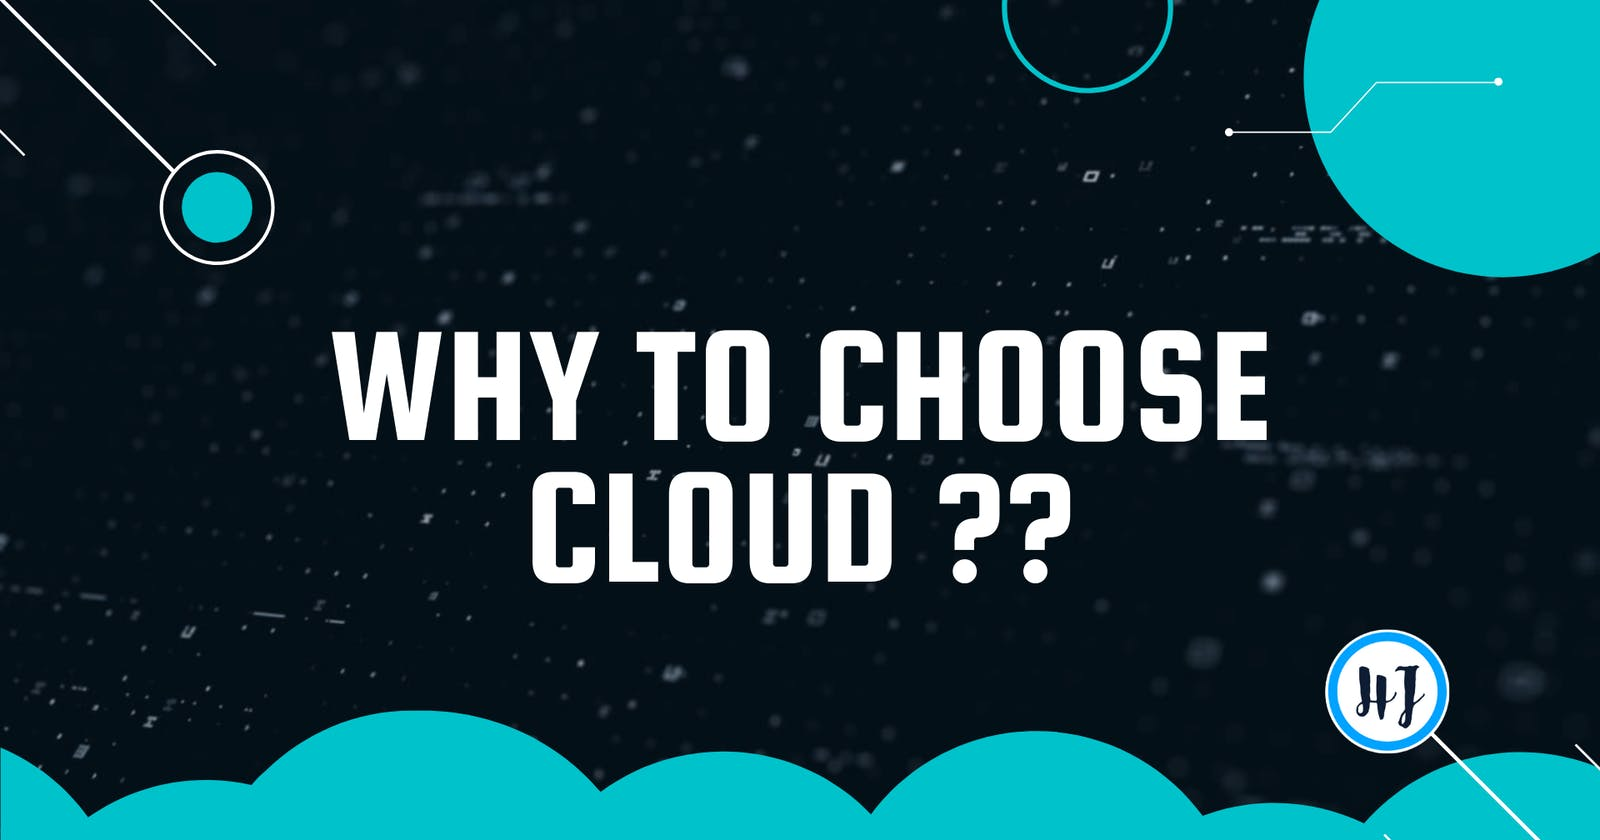 Why should we choose Cloud ?